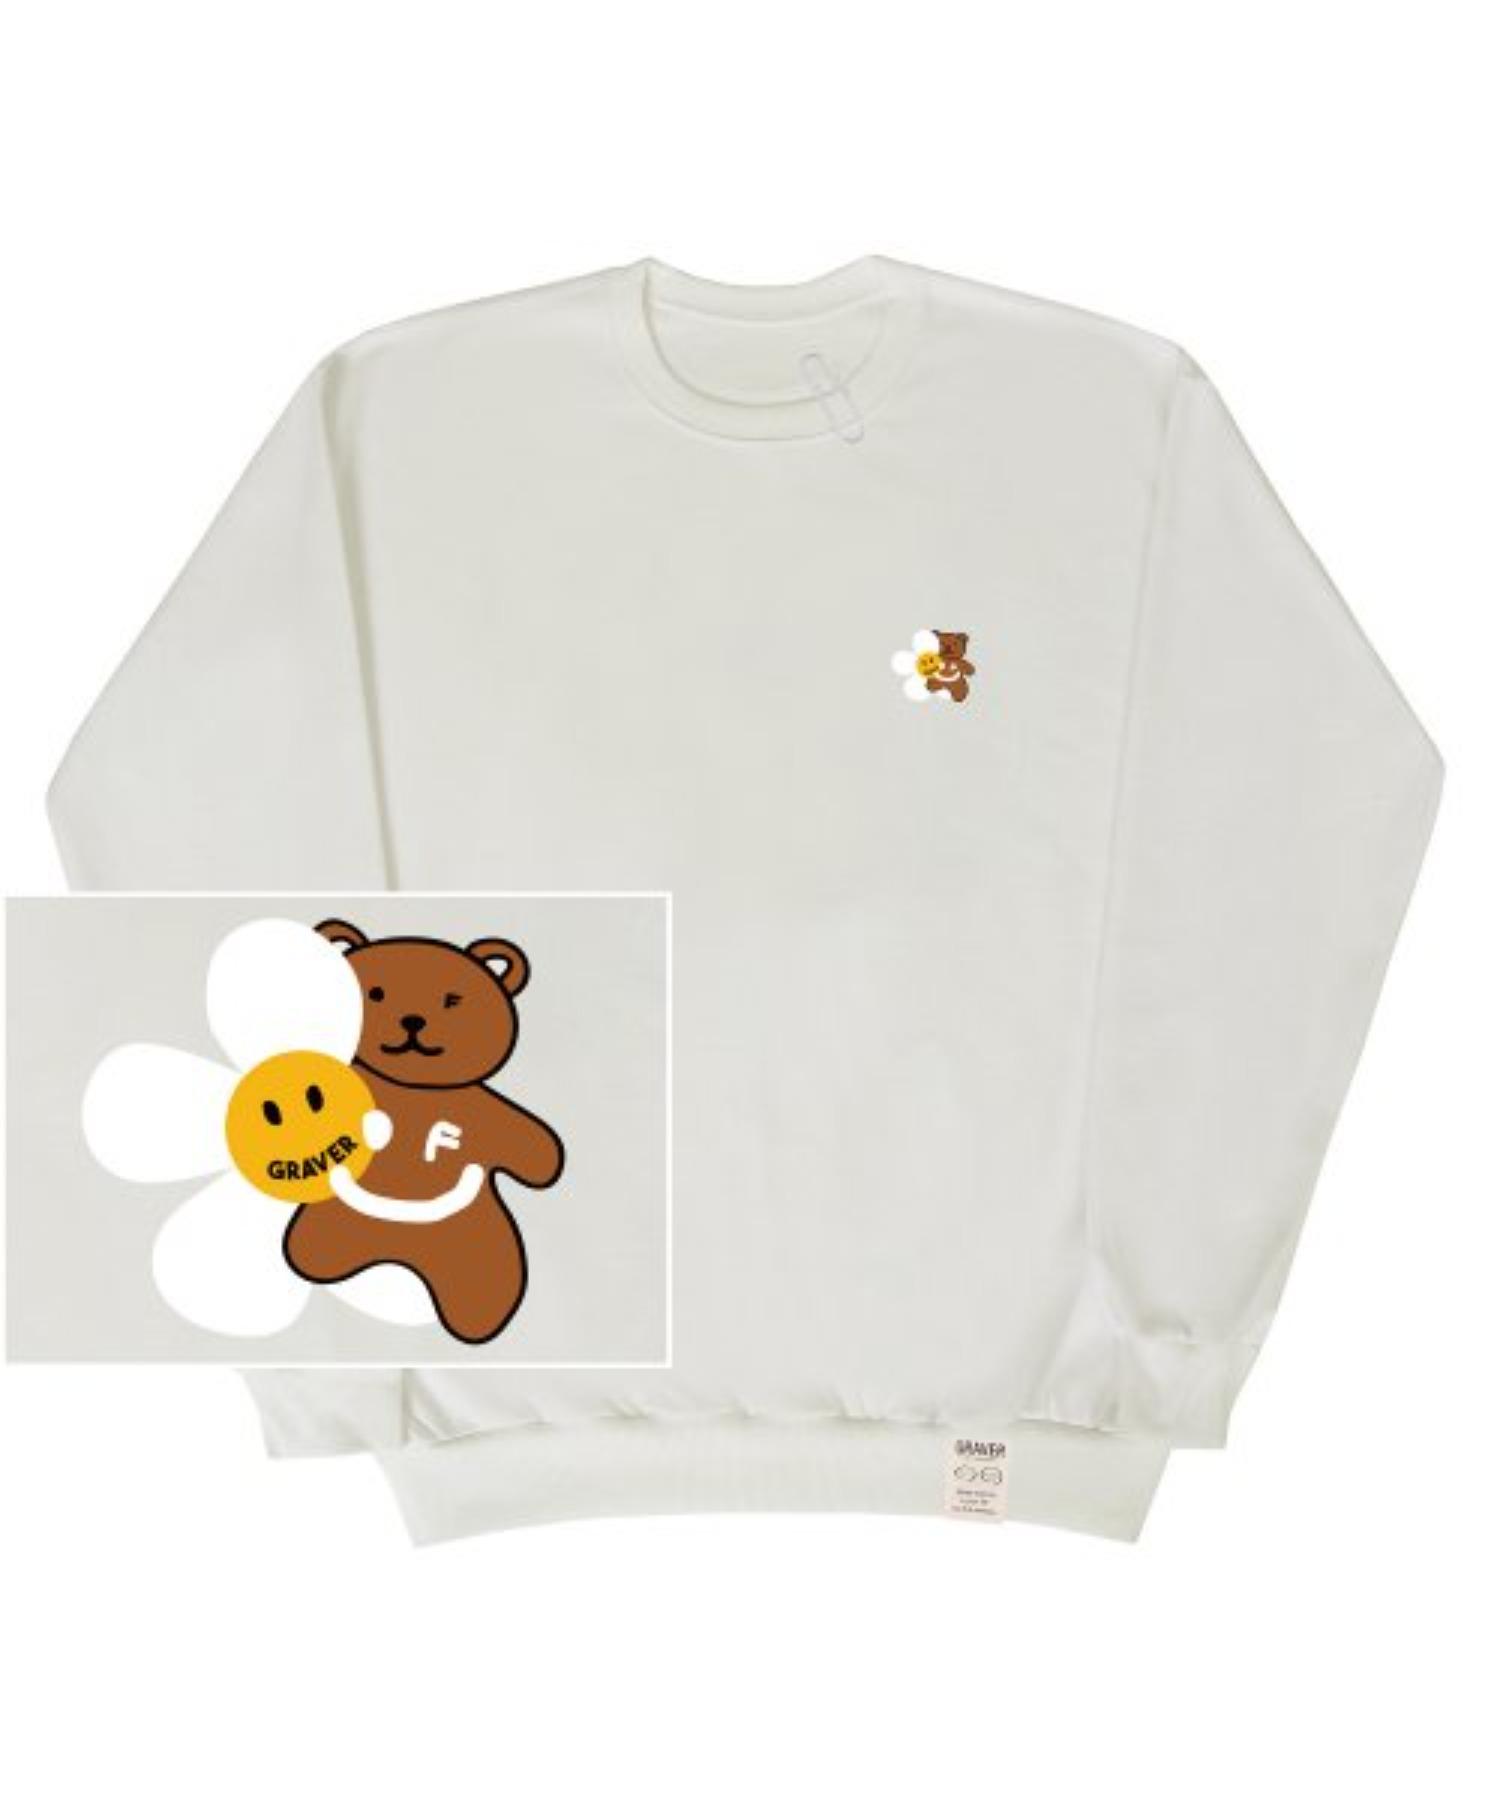 [UNISEX] Small Flower Bear Smile White Clip Sweatshirt_Ivory